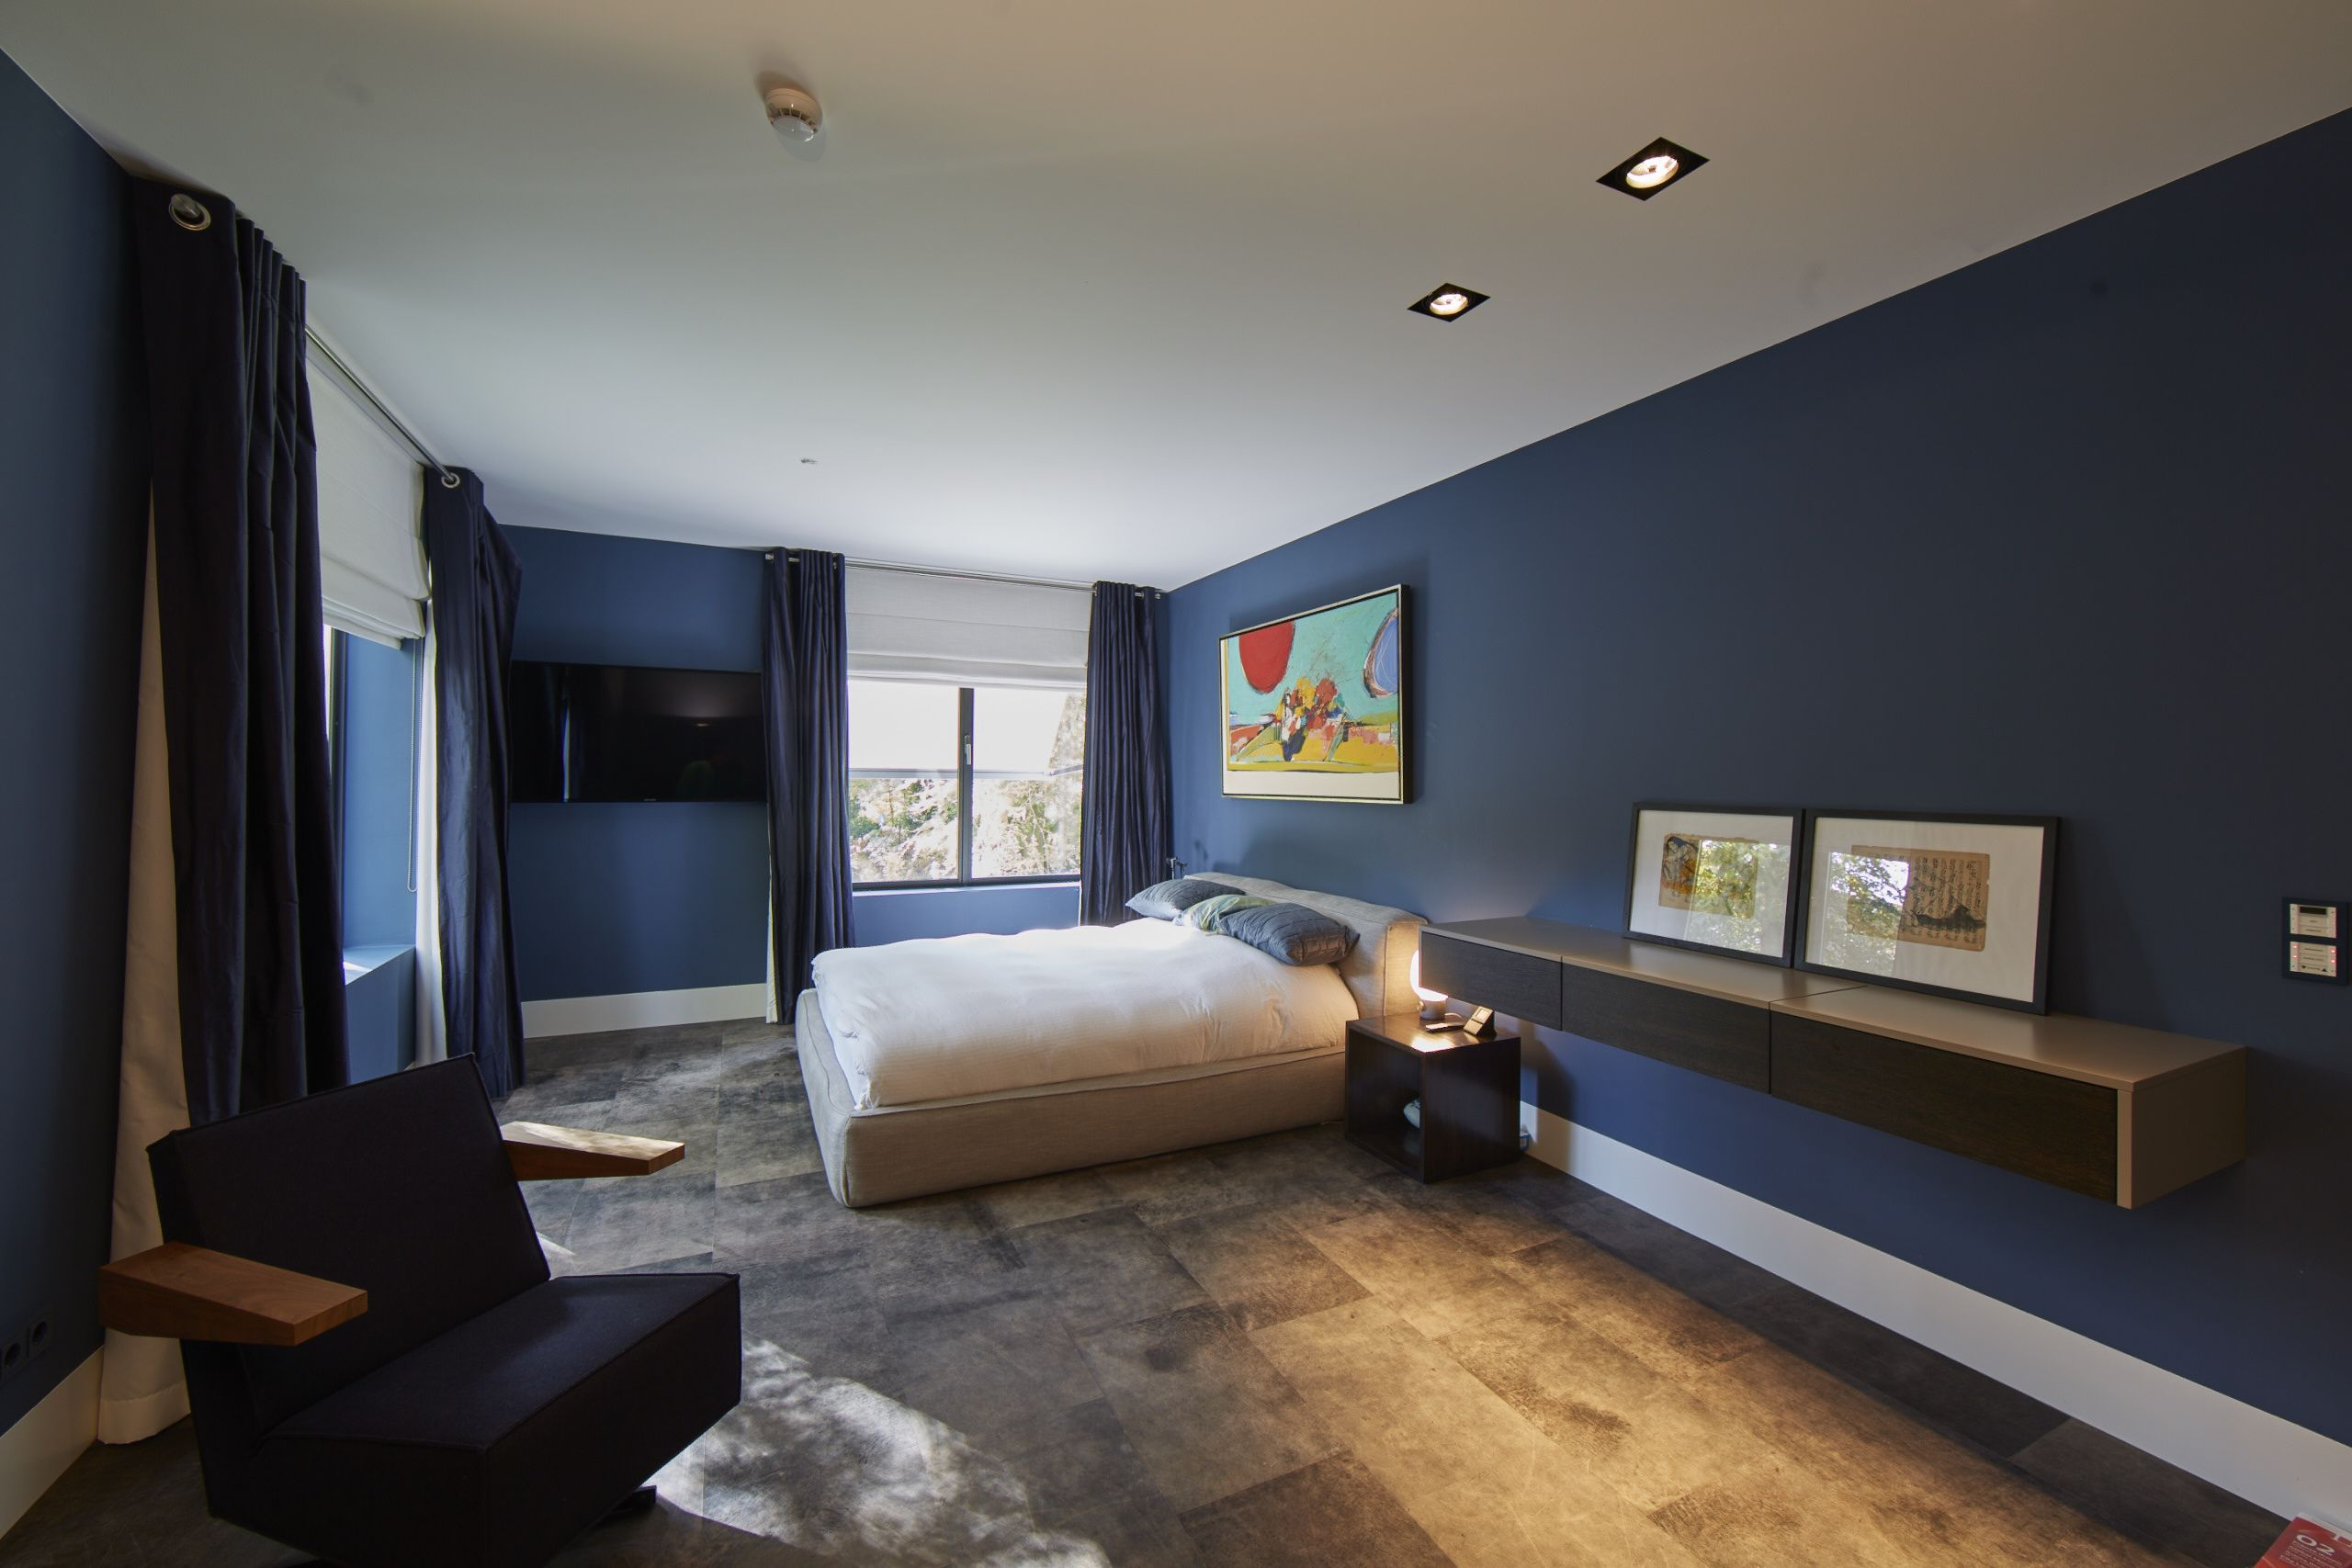 strakke blauwe slaapkamer met bruine vloer